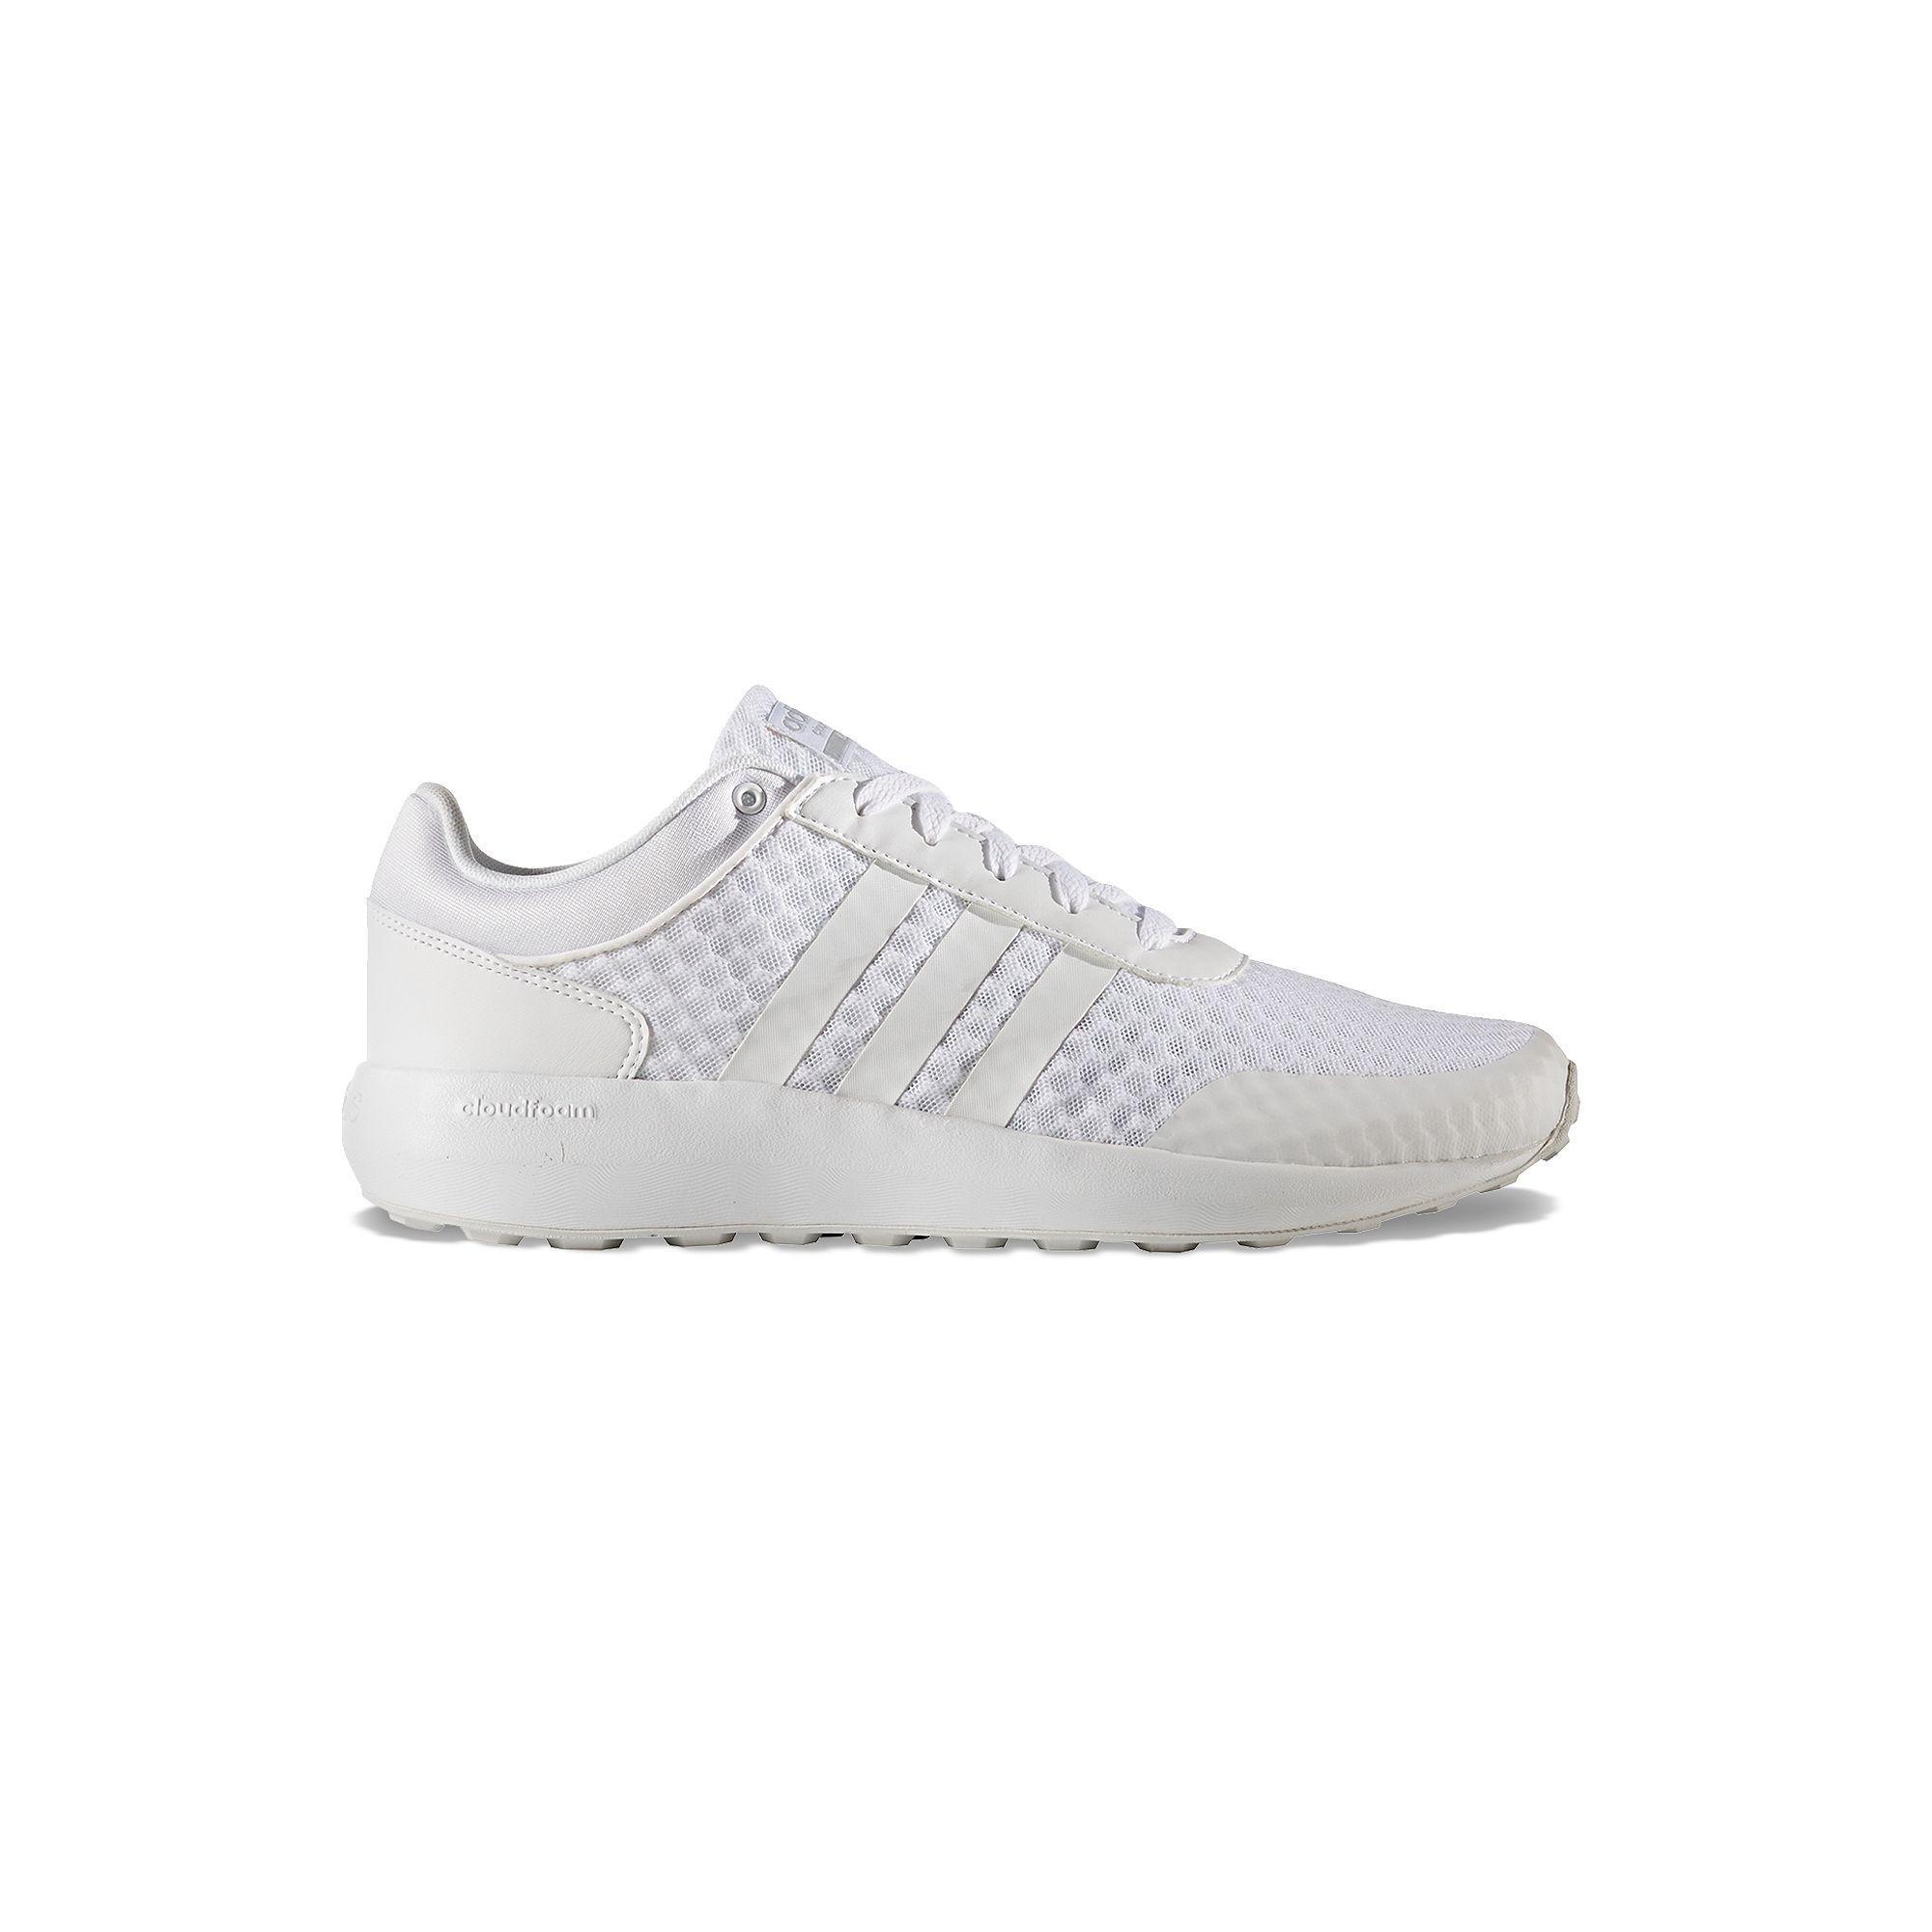 adidas cloudfoam race all white